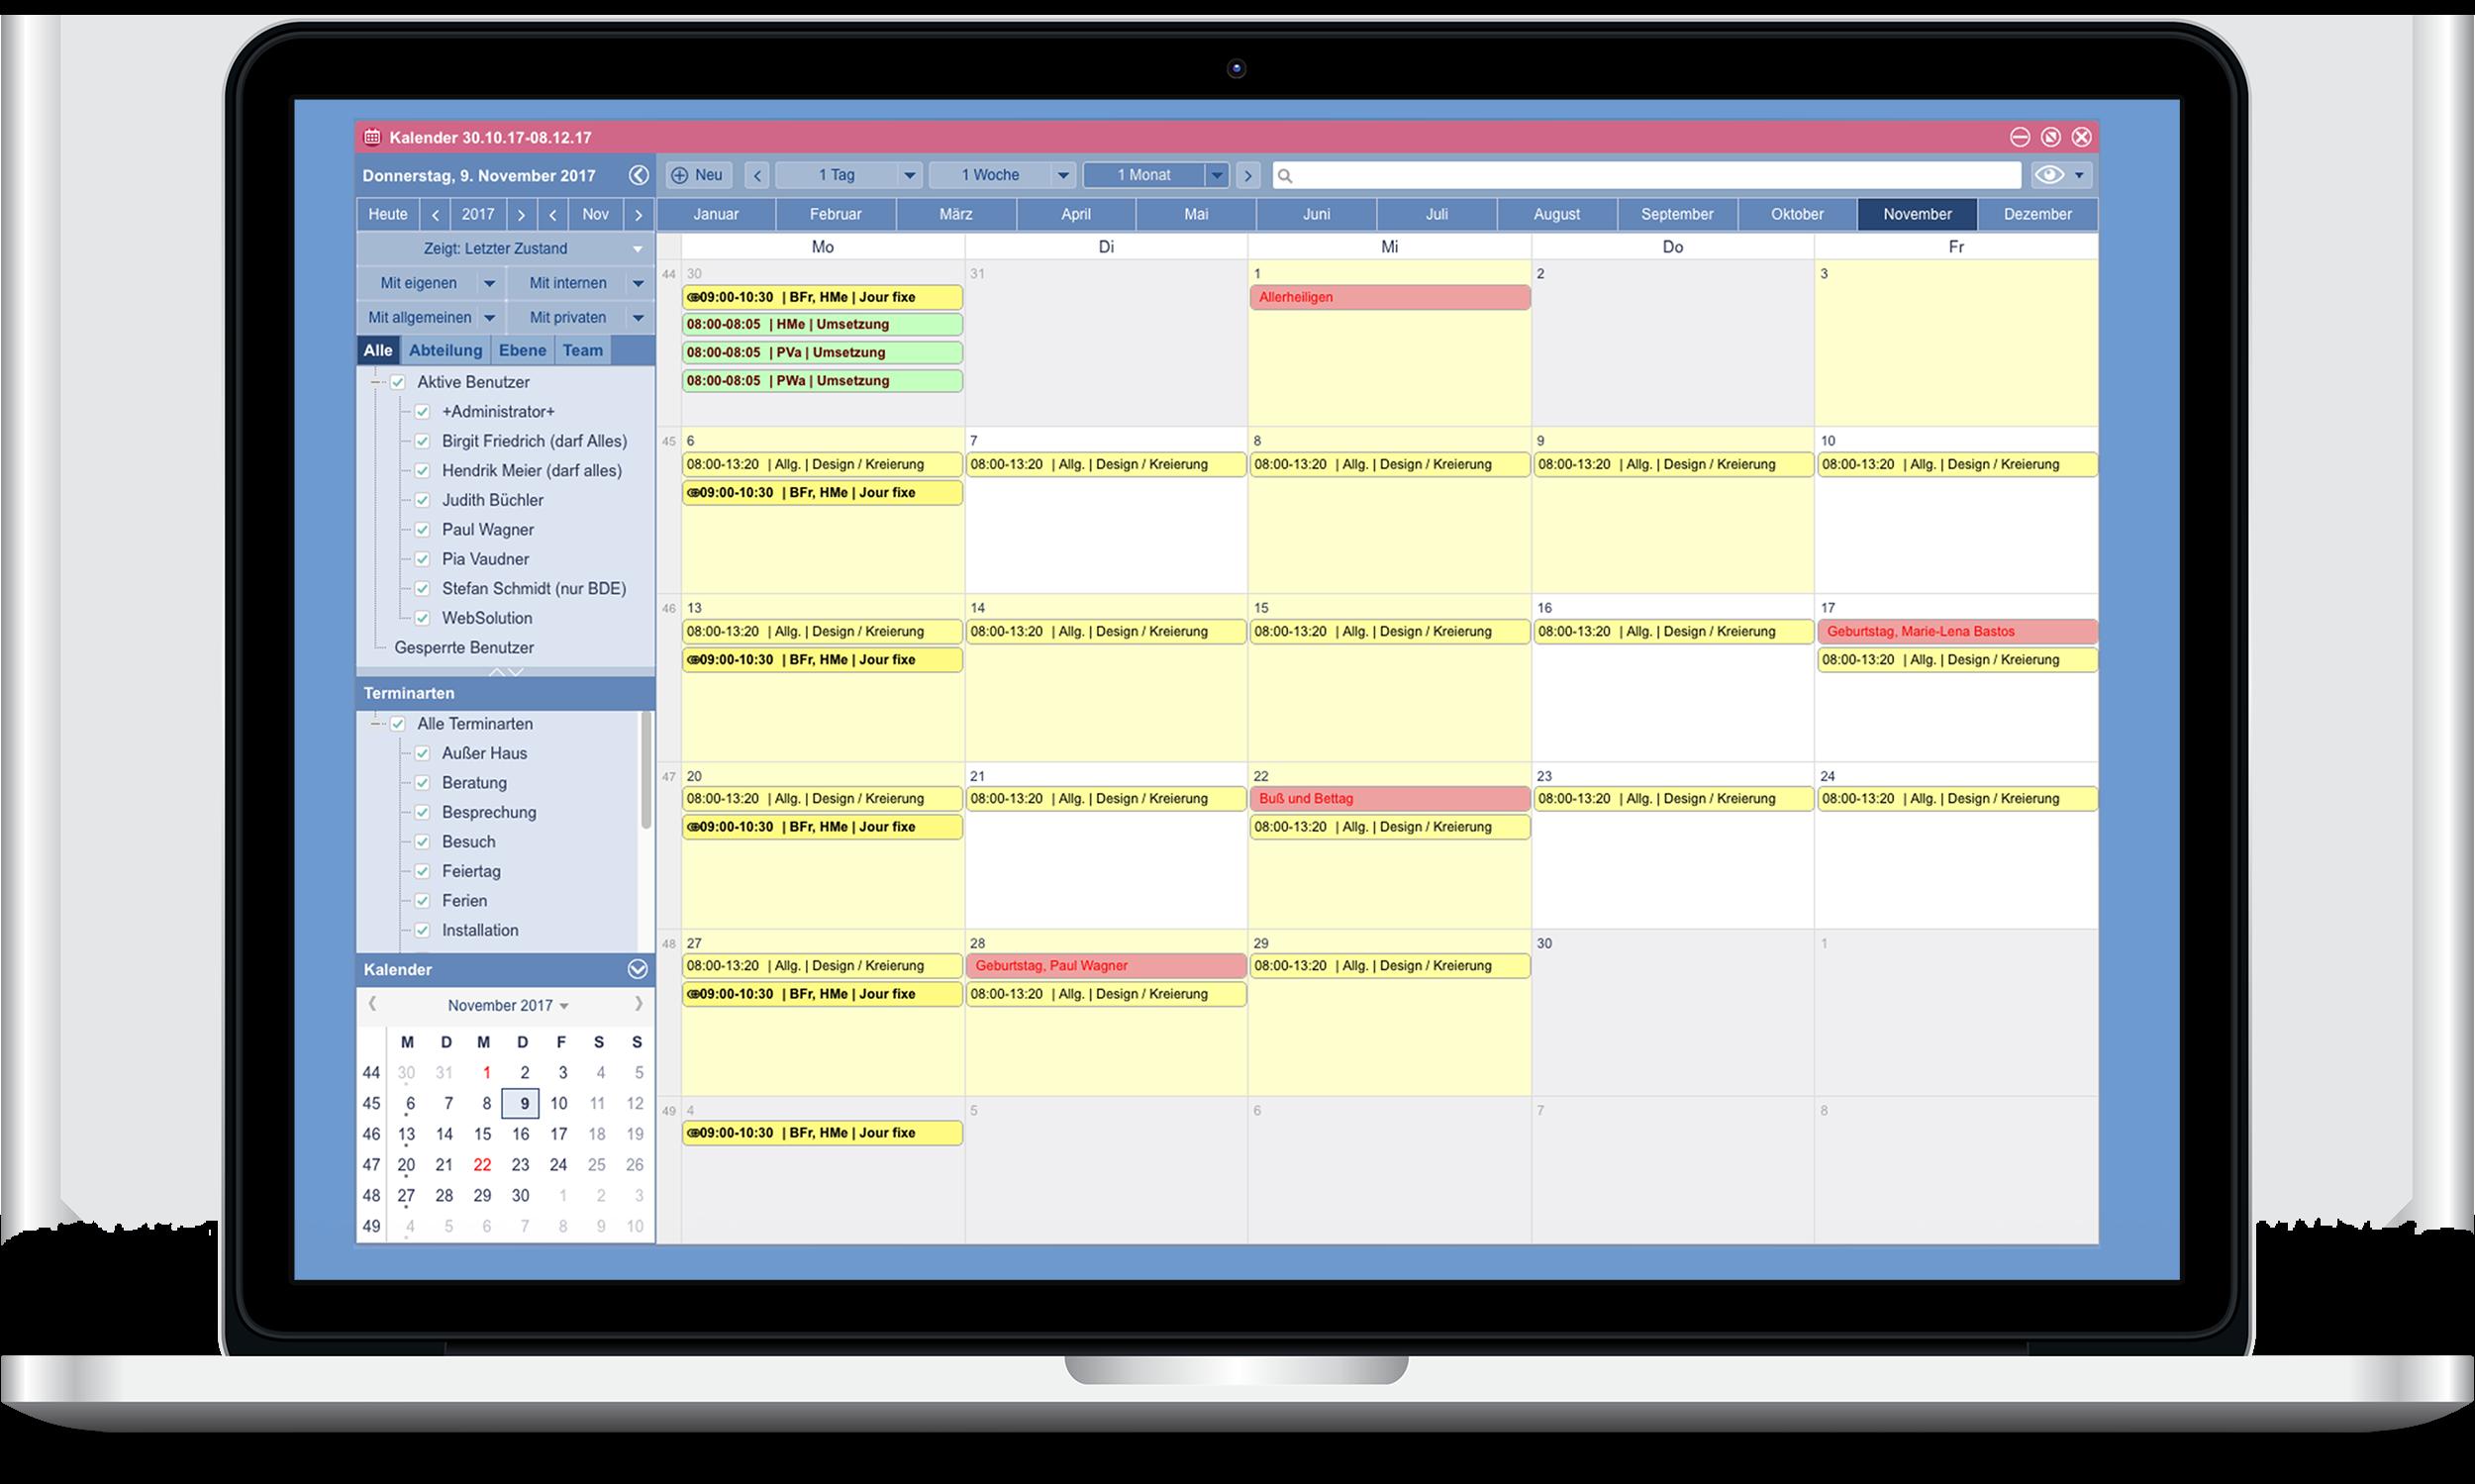 terminkalender_kalender_lt2500